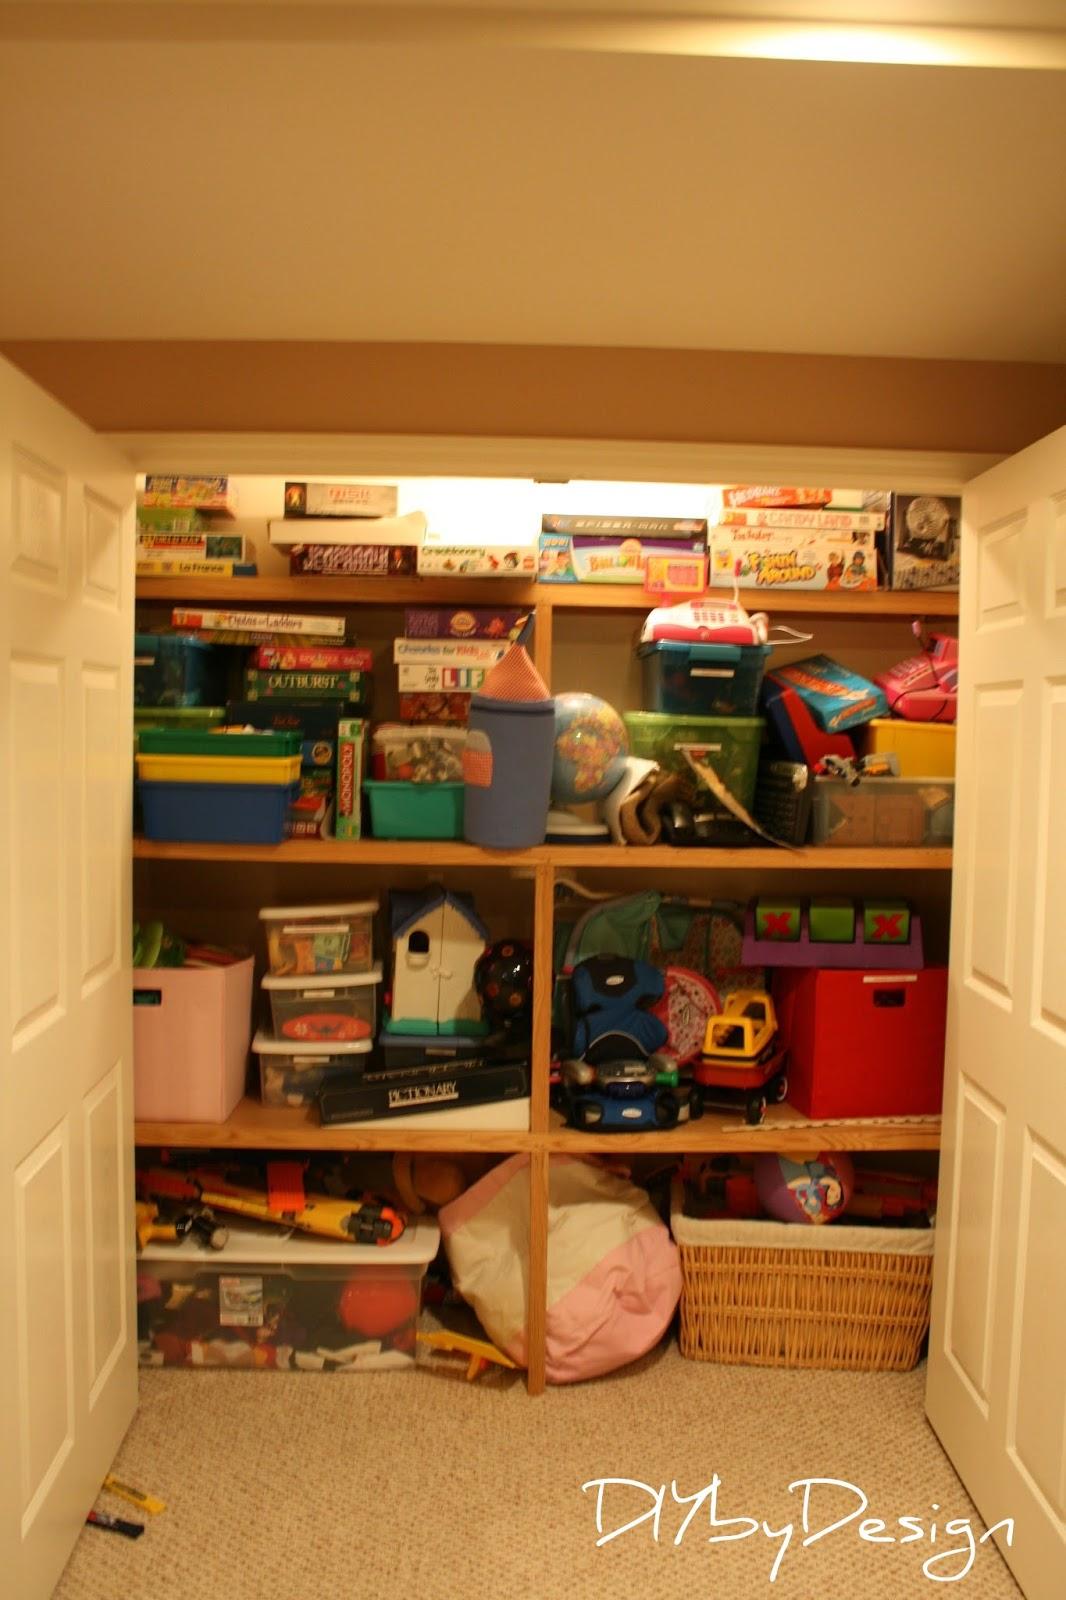 Diy by design craft closet ideas - Ideas almacenaje juguetes ...